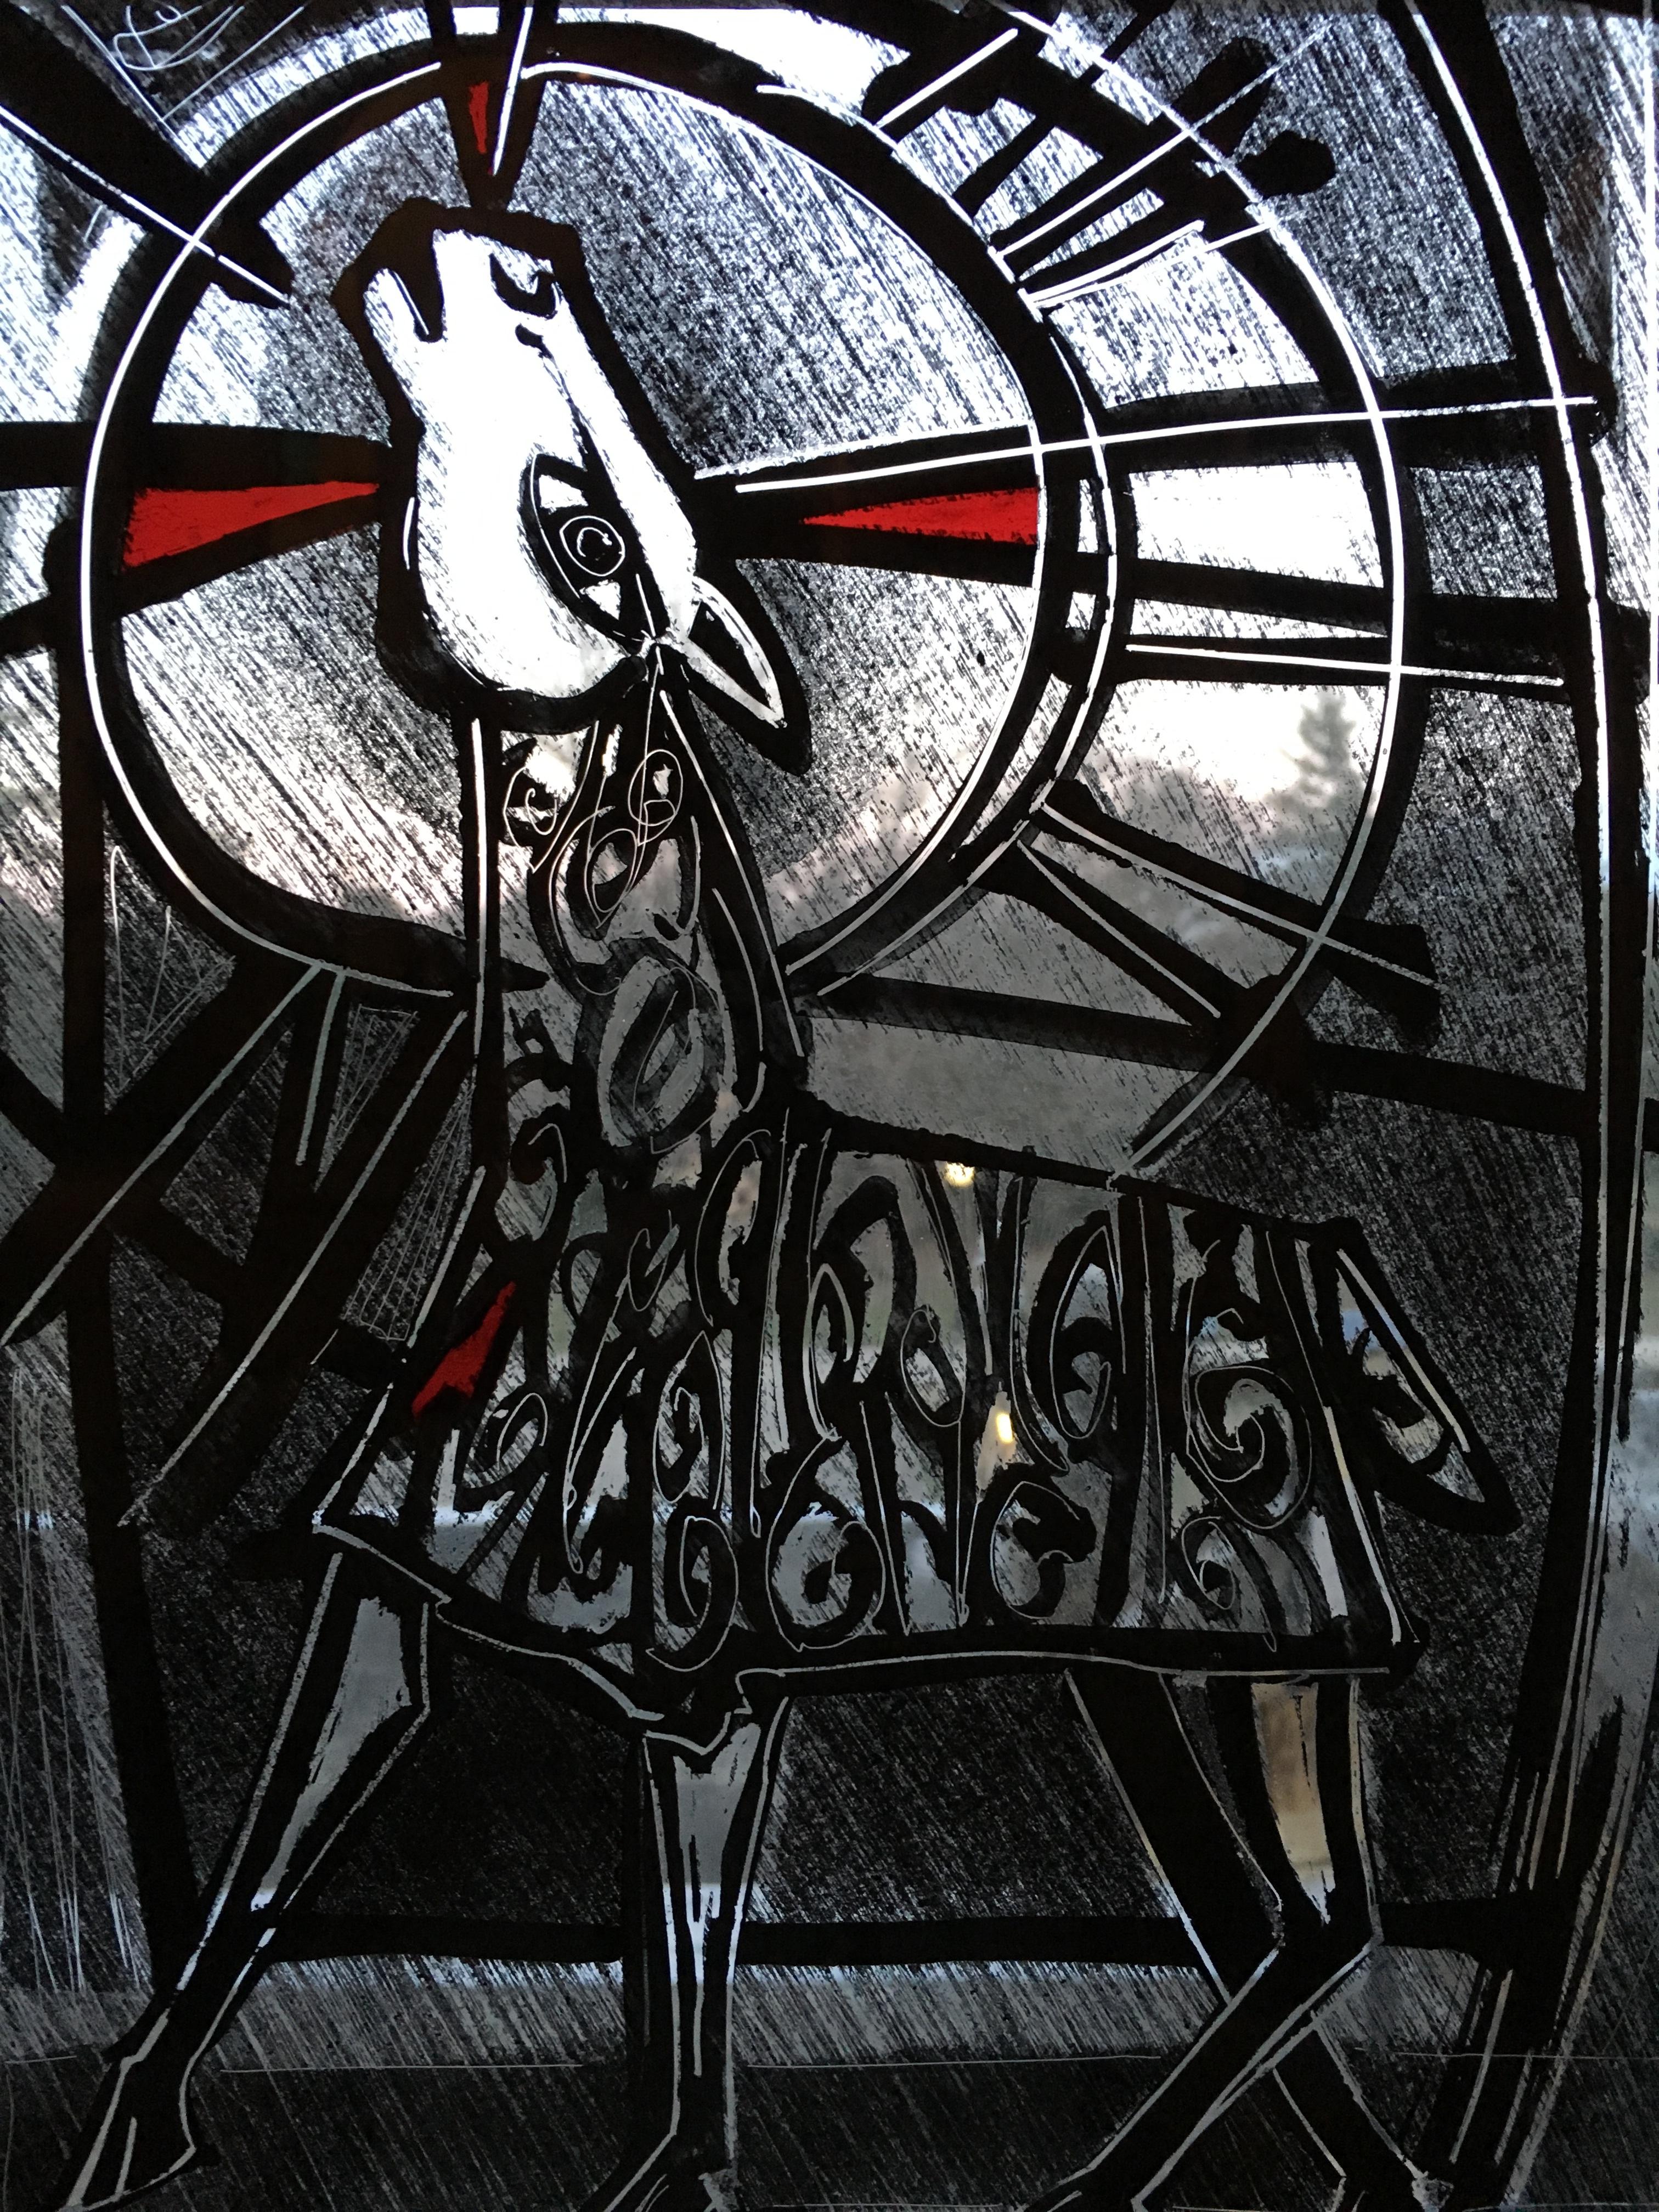 Free images light black and white architecture wheel window stone contemplation decoration symbol entrance father religion landmark church historic cross christian door decor tire bible spiritual altavistaventures Gallery